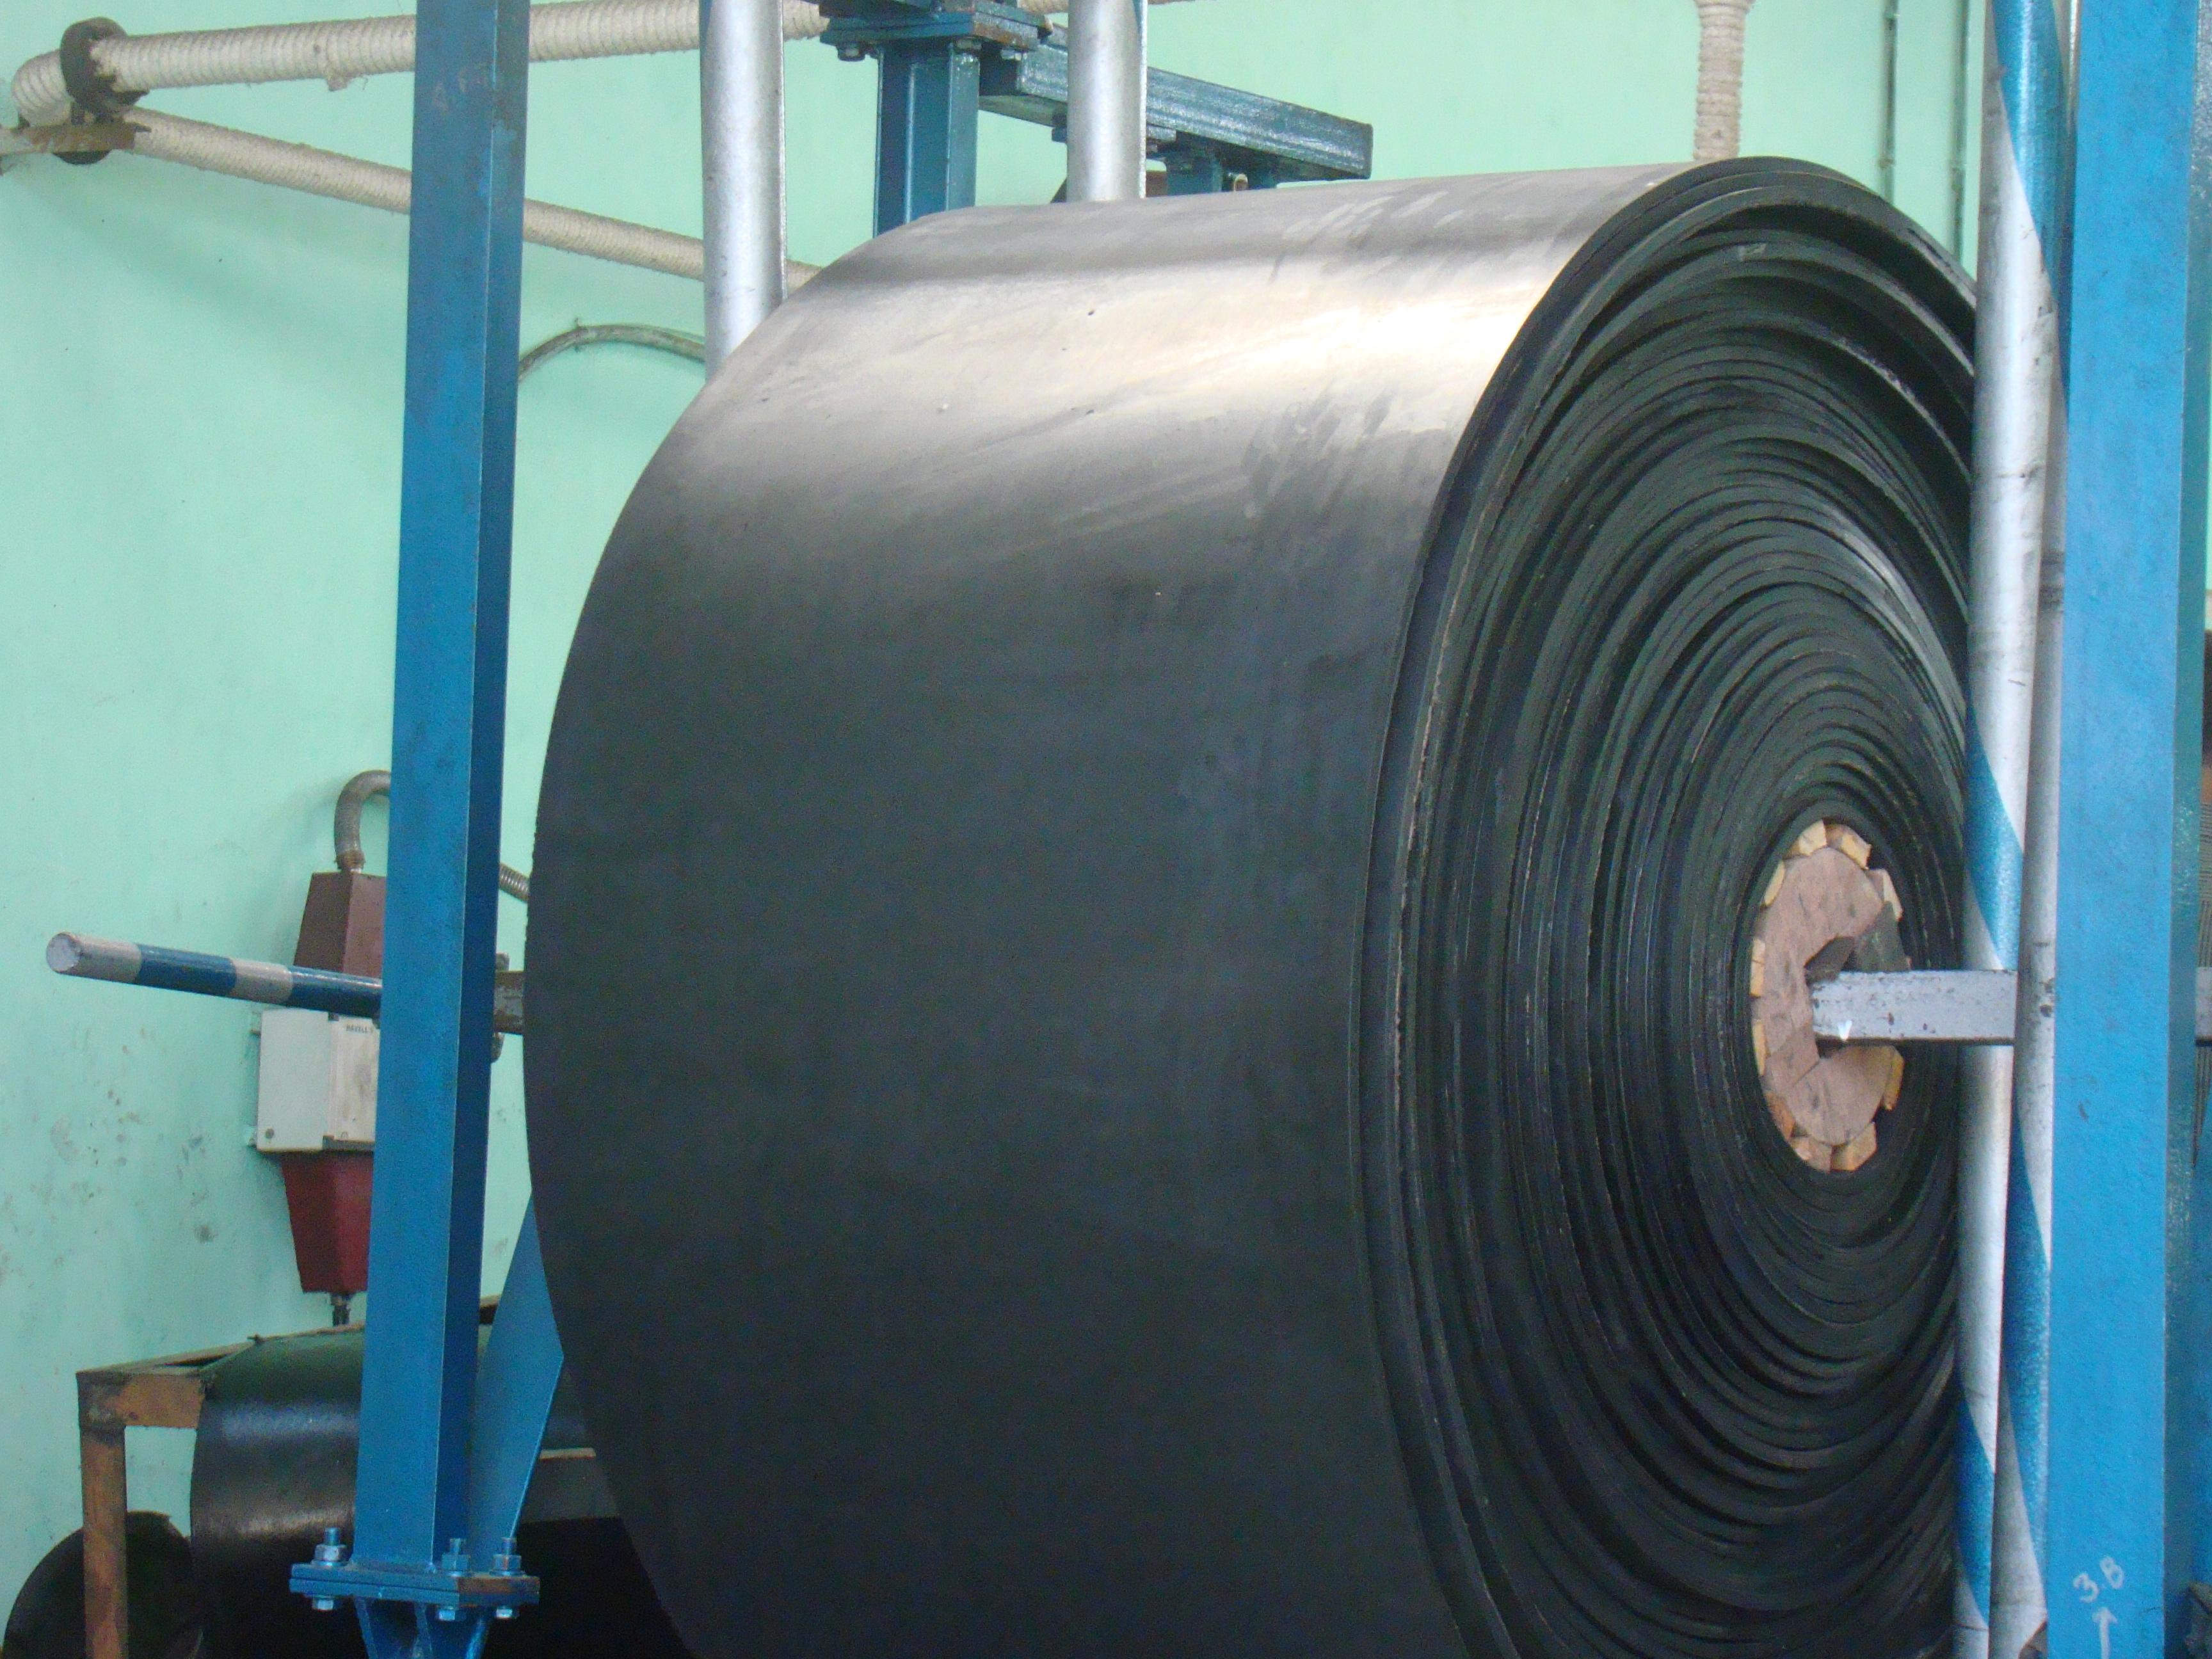 Industrial Rubber Conveyor Belts - Industrial Rubber